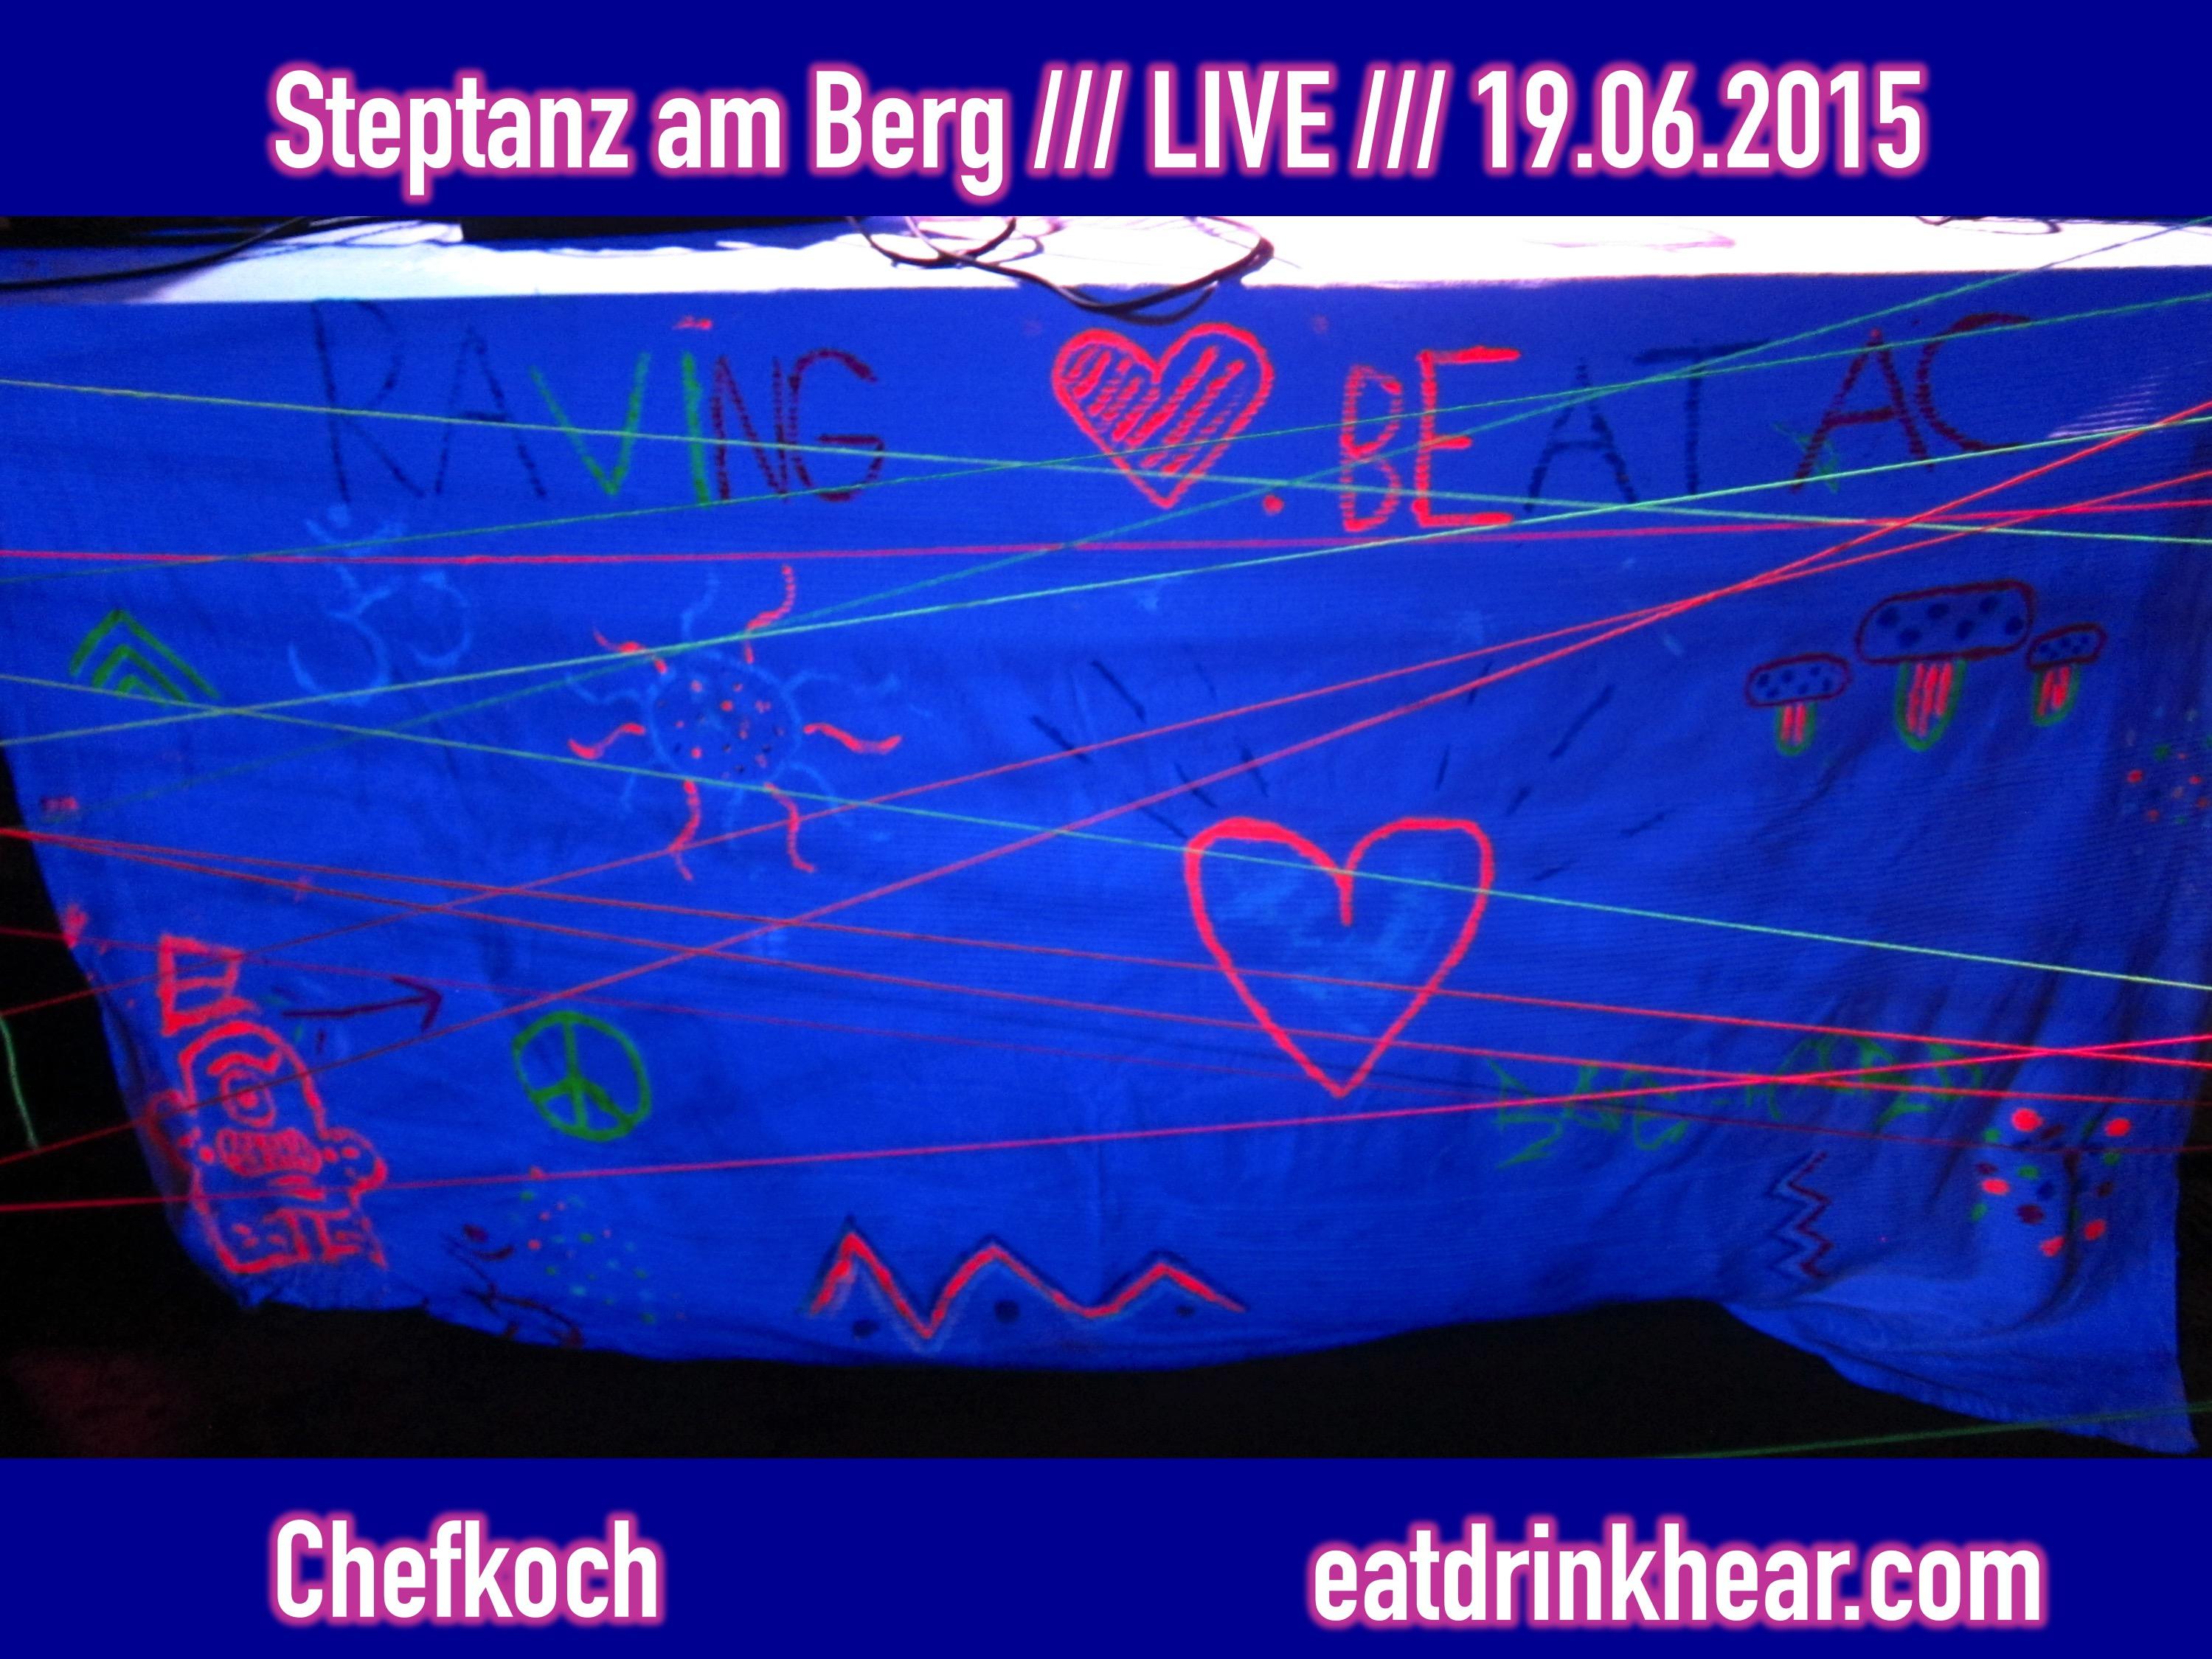 <!--:de-->Steptanz am Berg /// LIVE /// 19.06.2015 – Chefkoch<!--:--><!--:en-->Steptanz am Berg /// LIVE /// 19.06.2015 – Chefkoch<!--:-->